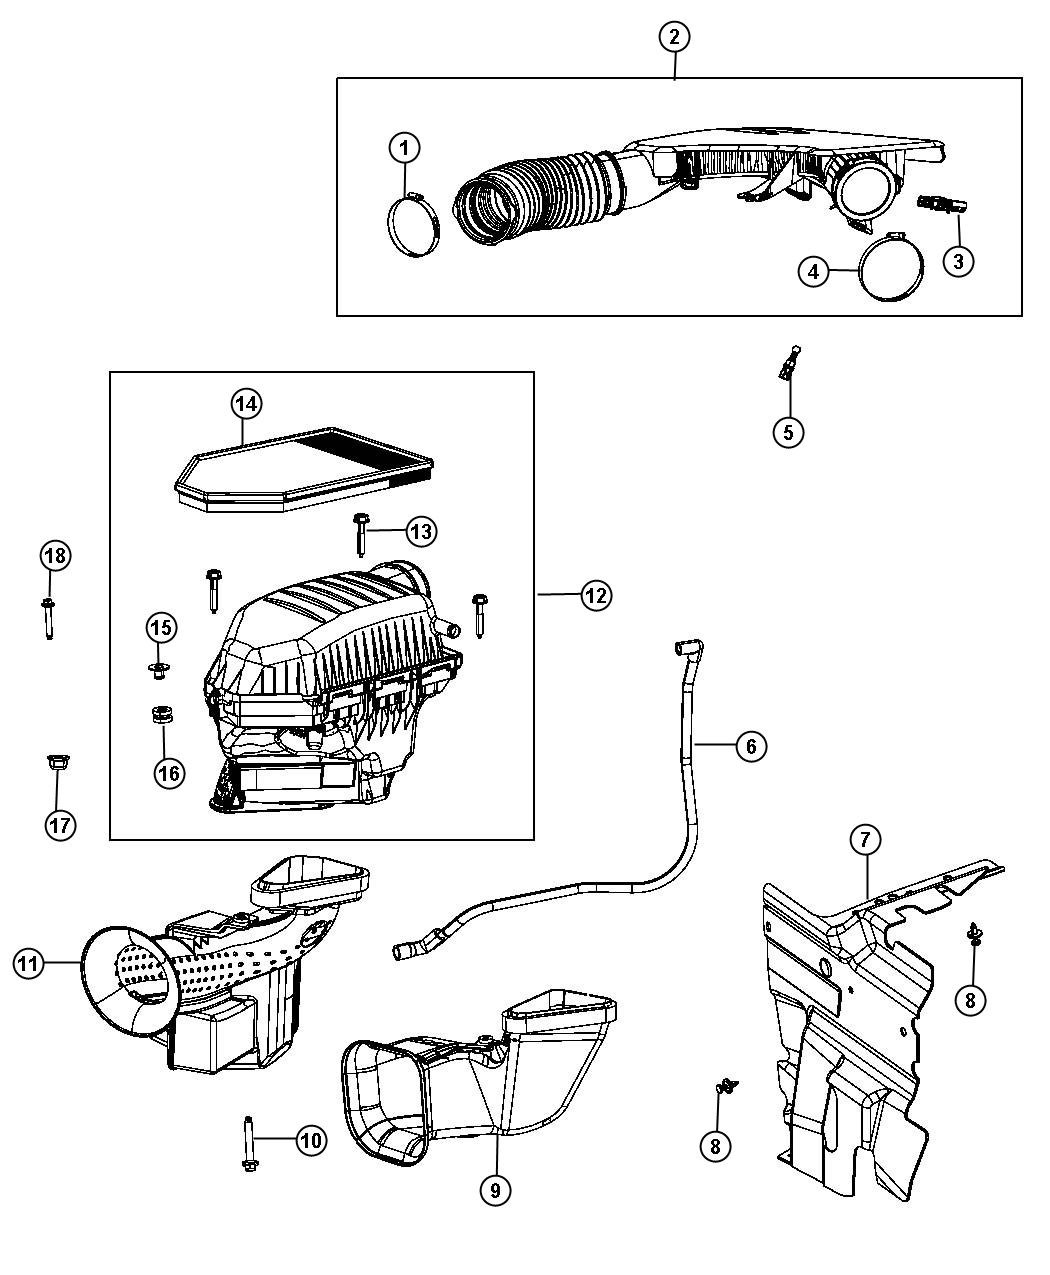 i2286043  Hemi Mds Vvt Engine Diagram on